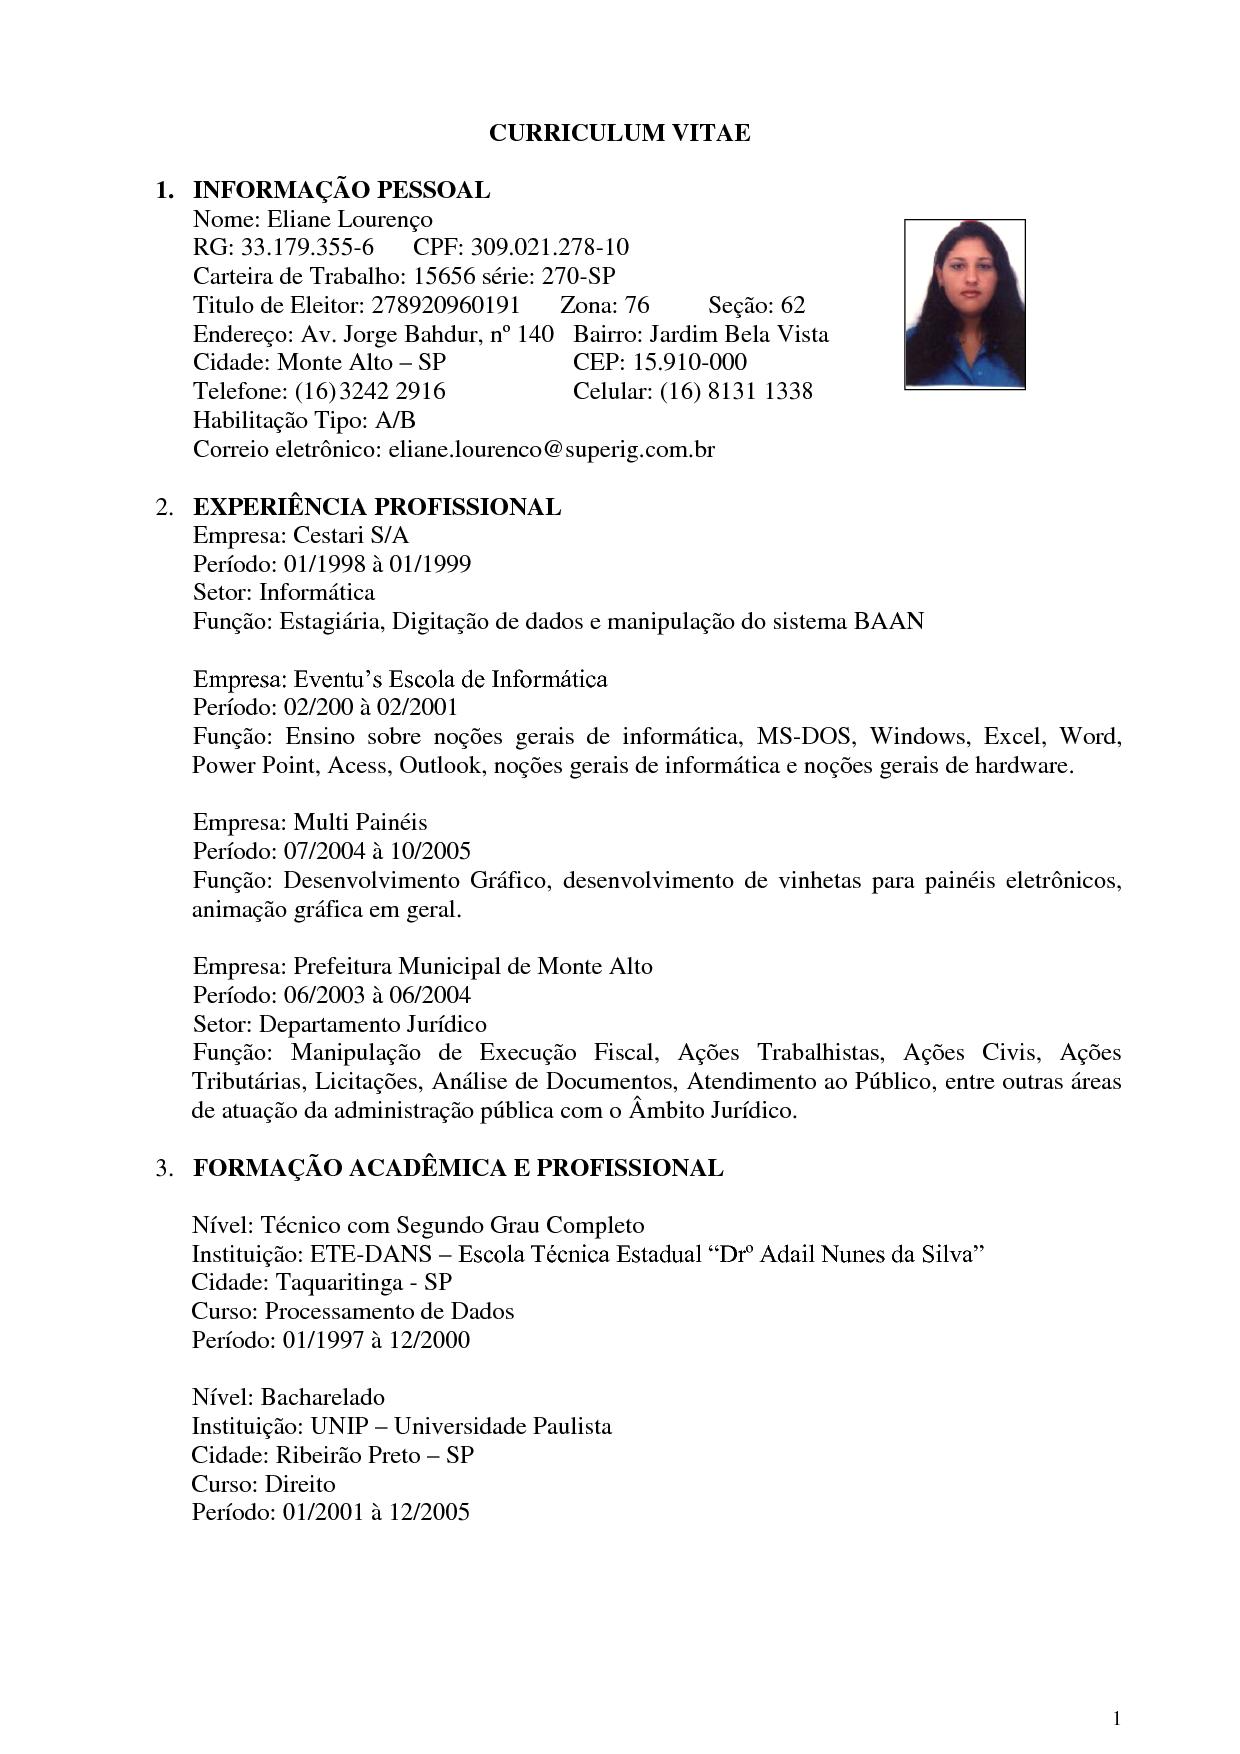 Modelo De Curriculum Vitae Avare Guia Avare Guia Oficial Da